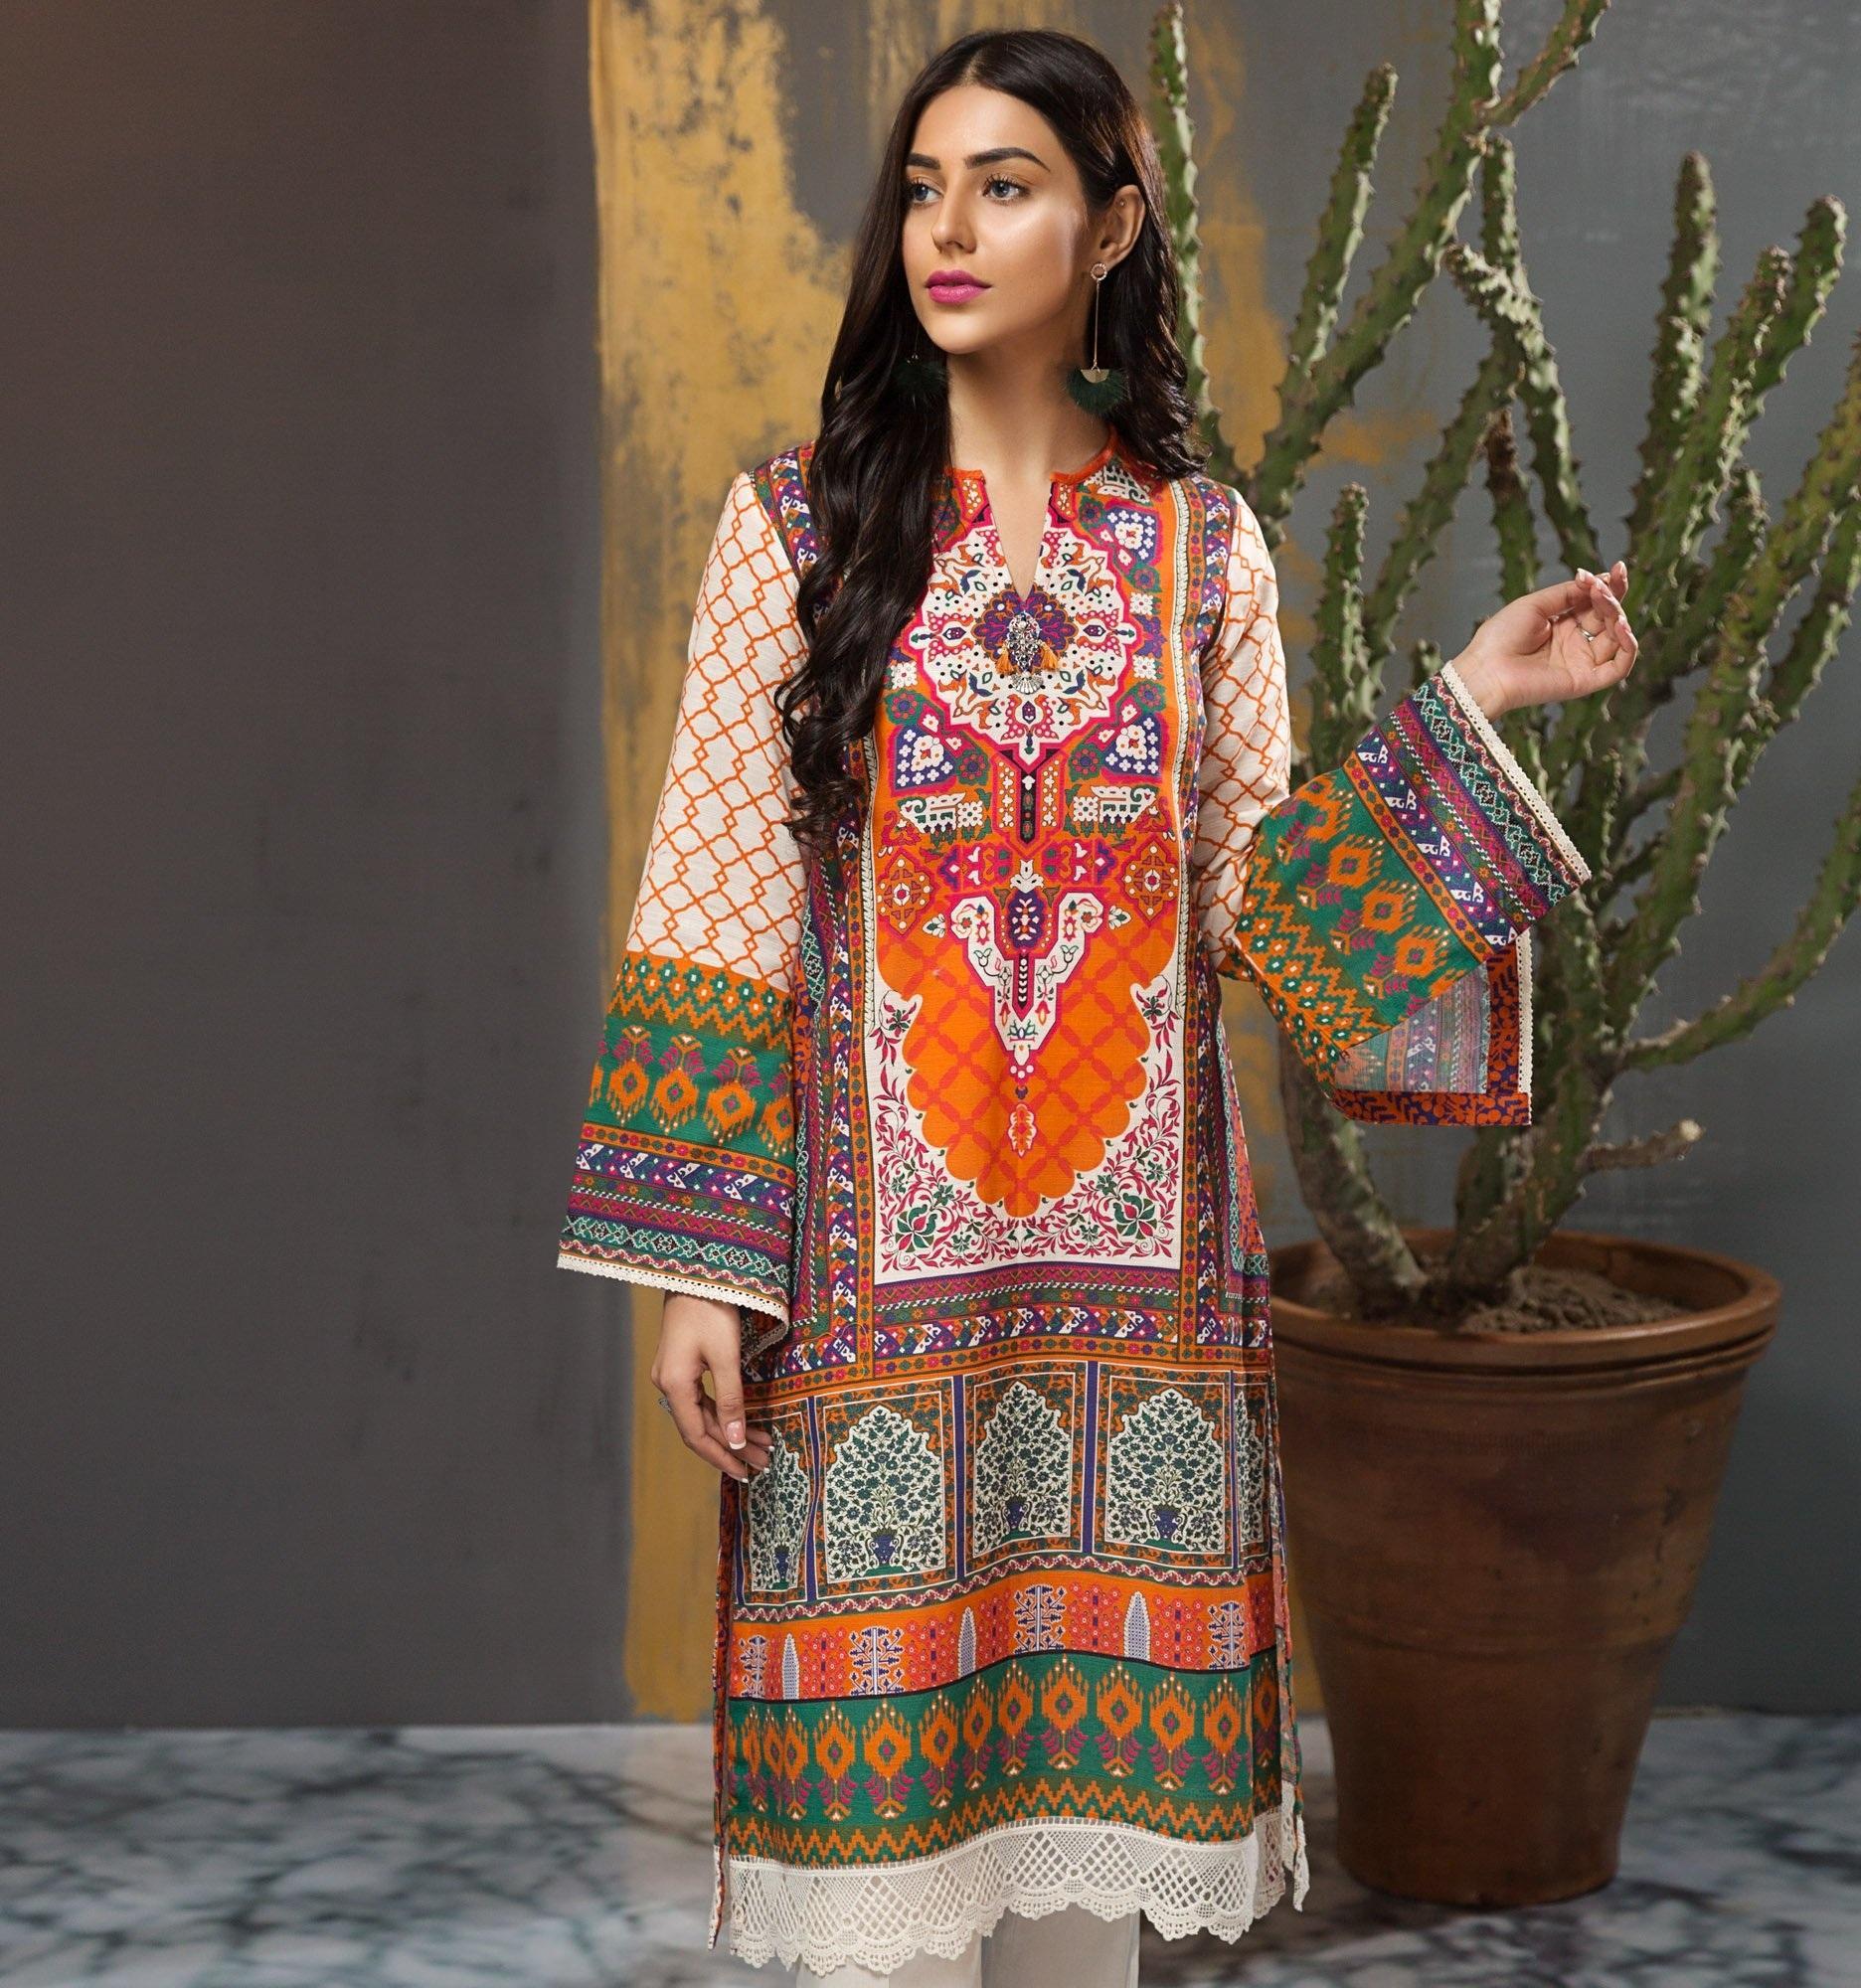 e78f3289899 Folk Lore Shirt Winter Collection Orange Khaddar 1pc  -Unstitched-U0394-SSH-ORG